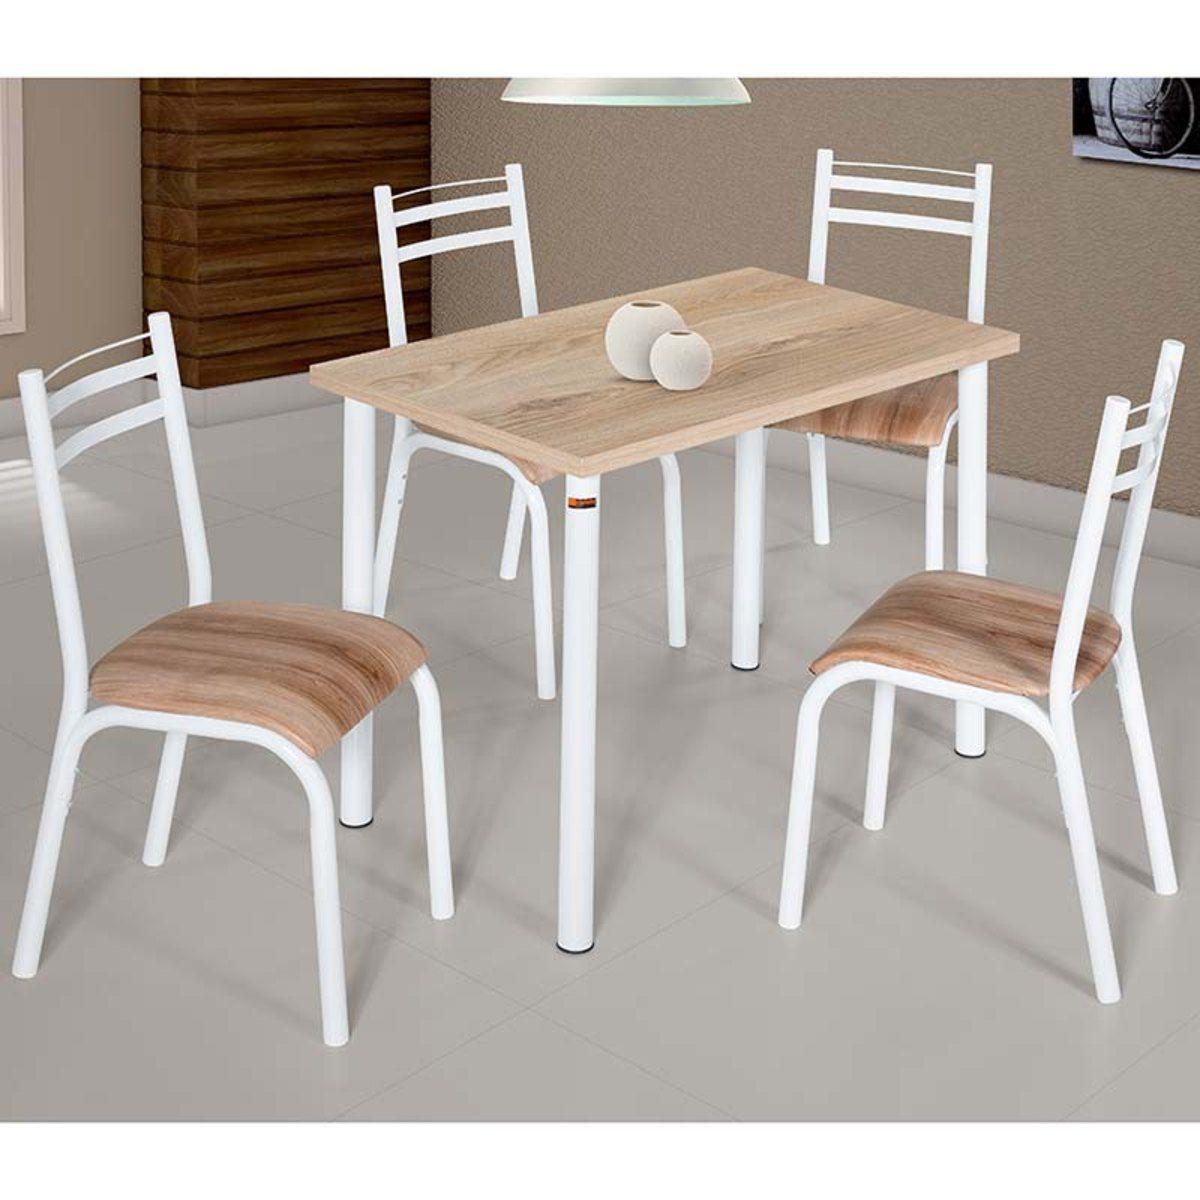 Conjunto de Mesa 1.10 Plaza CMCM com 4 Cadeiras Plaza Branco/Capuccino BRCN Ciplafe